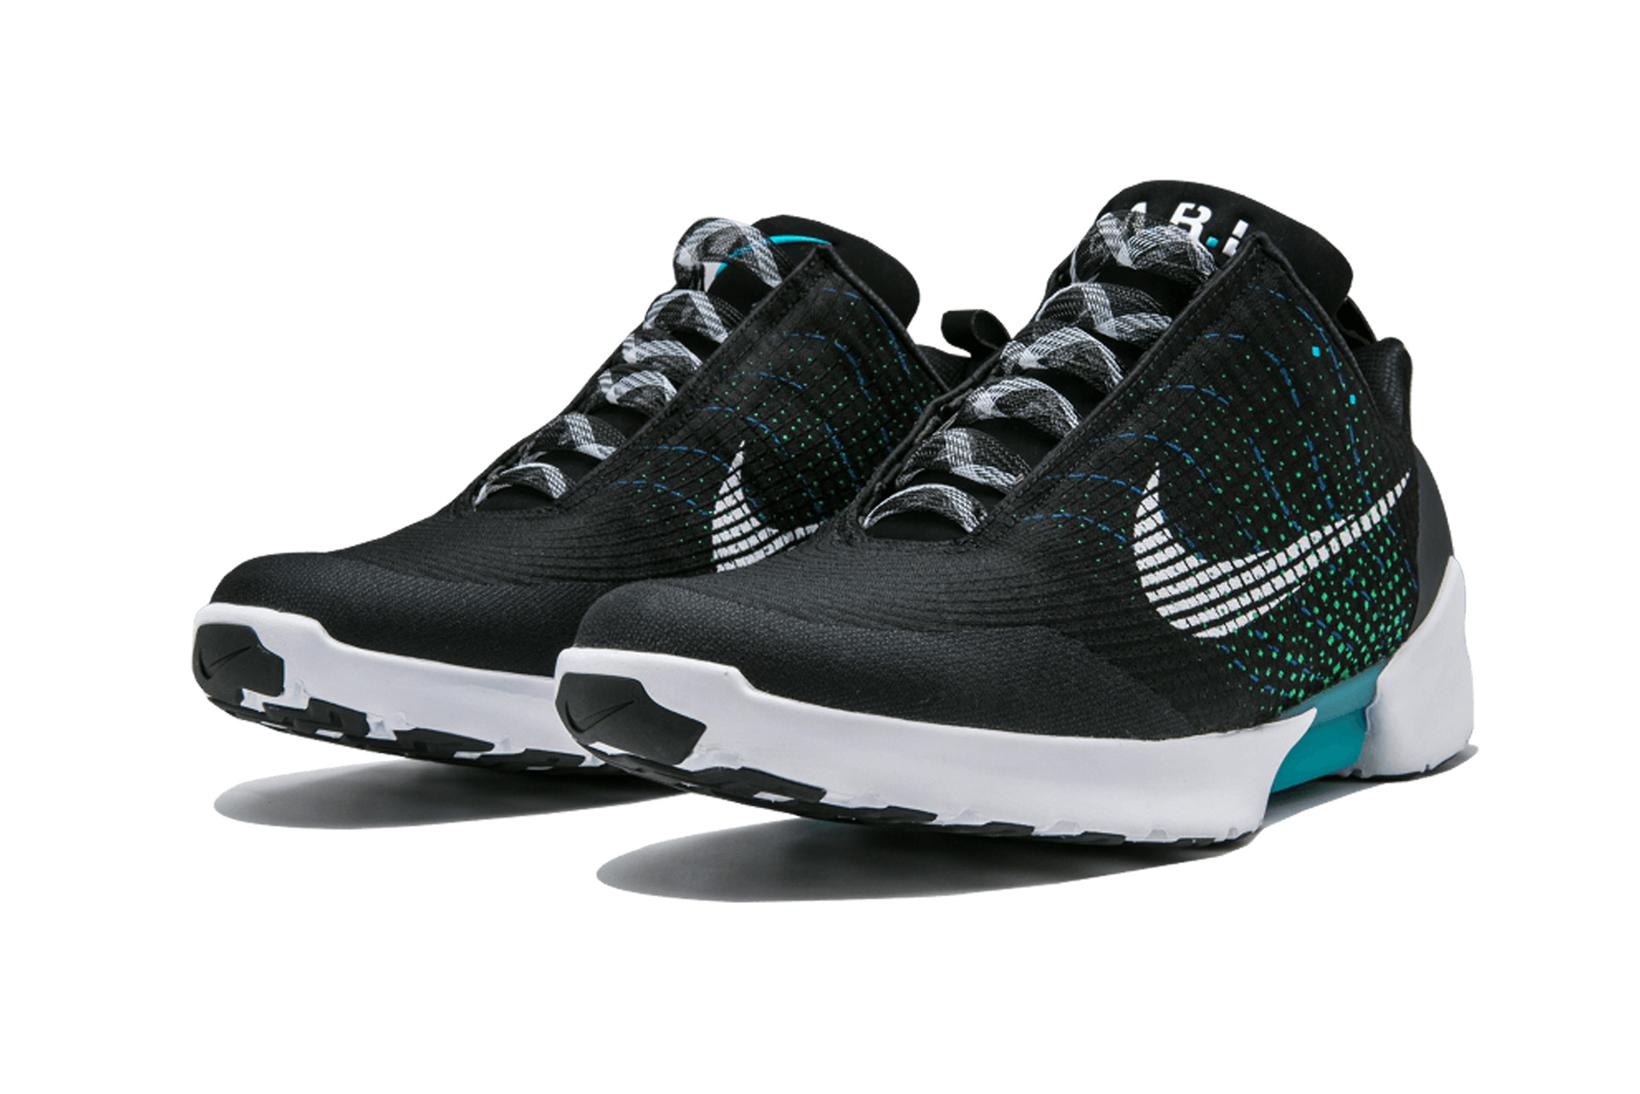 Stadium Goods Nike adidas YEEZY Kobe NMD